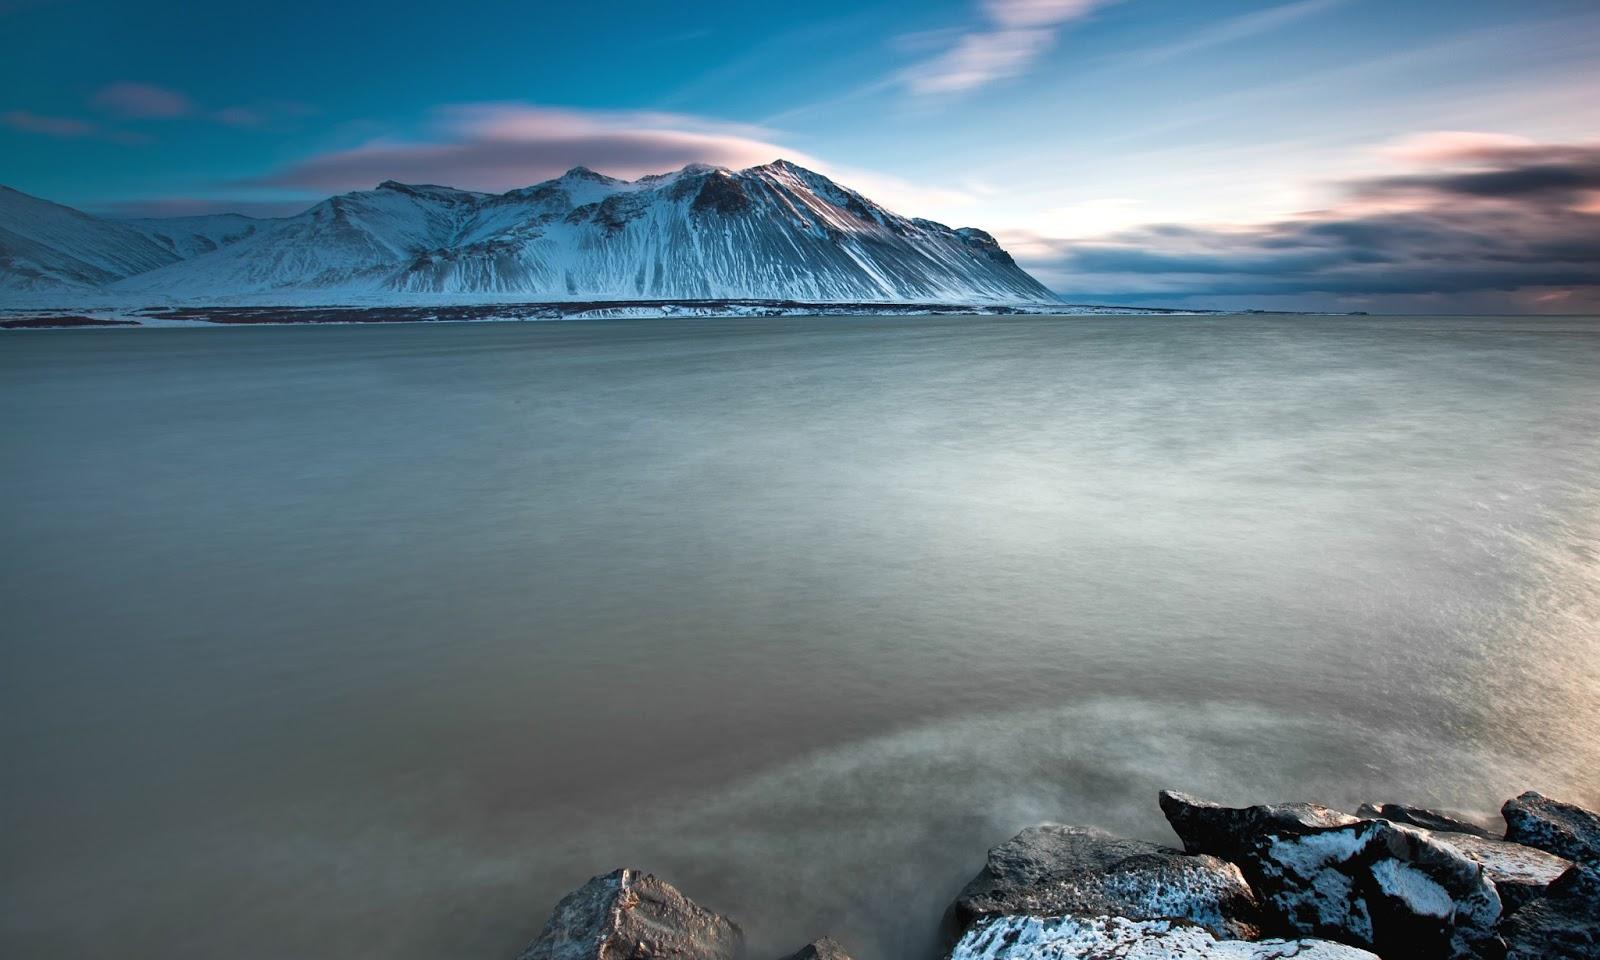 iceland 4k wallpaper - photo #34